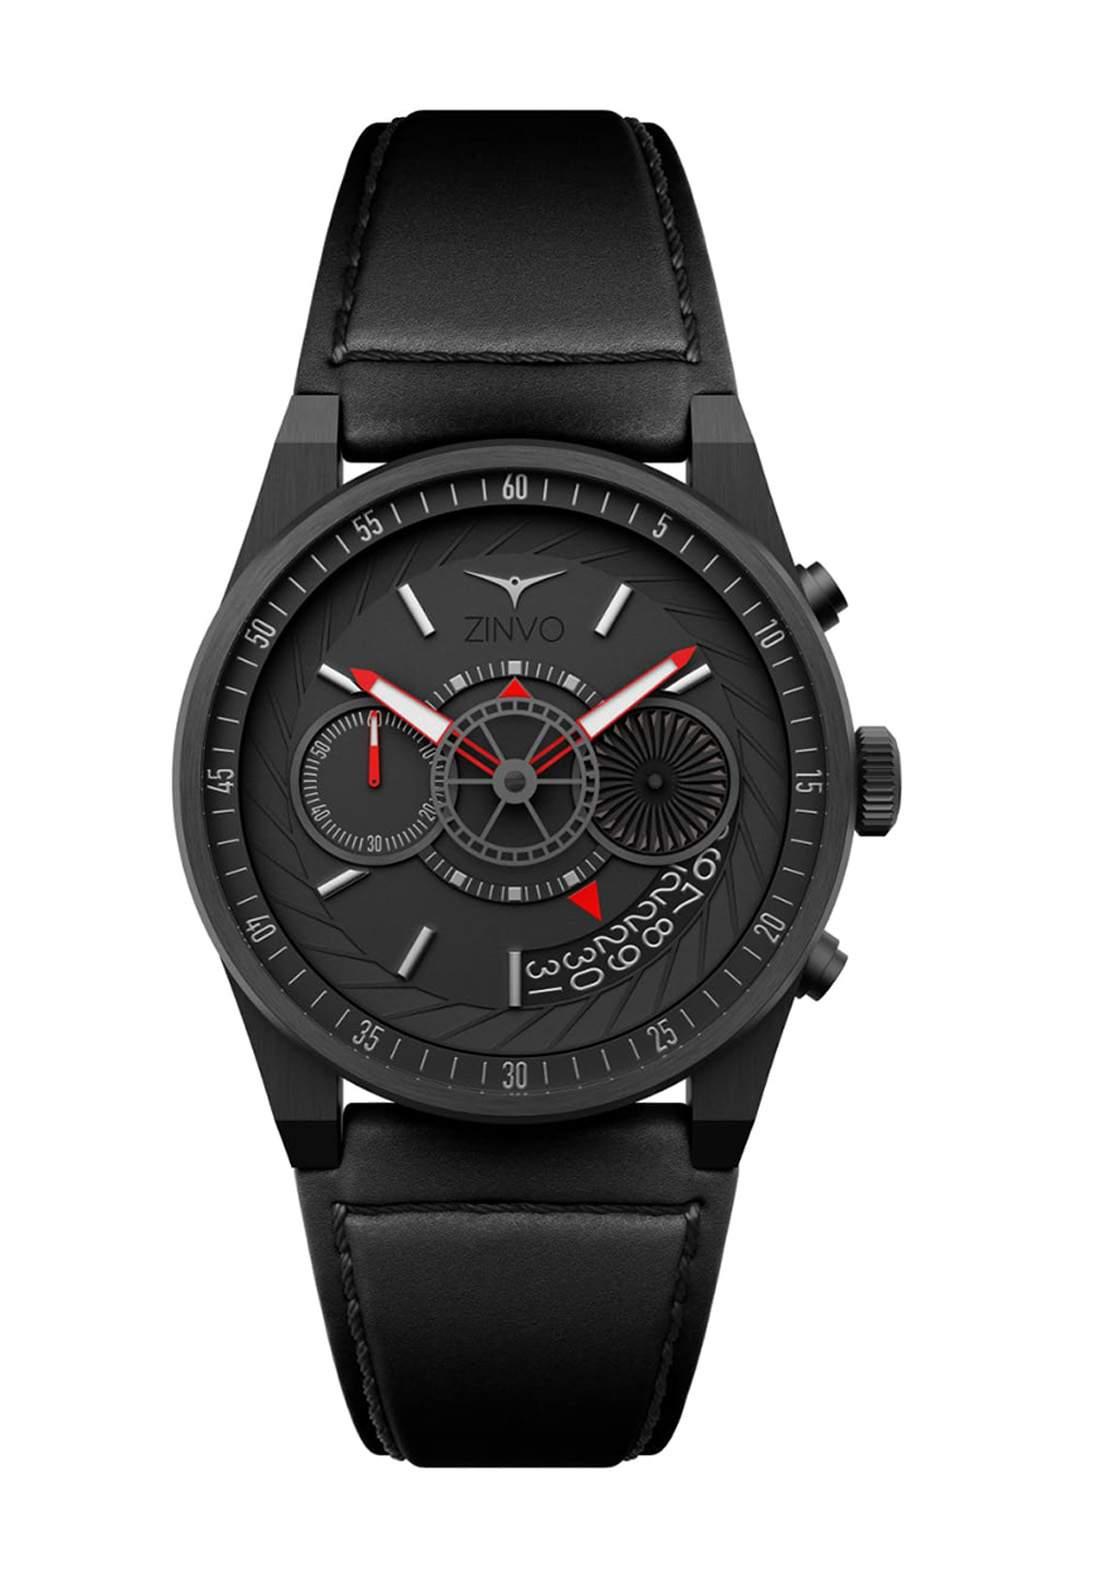 Zinvo Rival Chrono Gunmetal Watch For Men - Black  ساعة رجالي